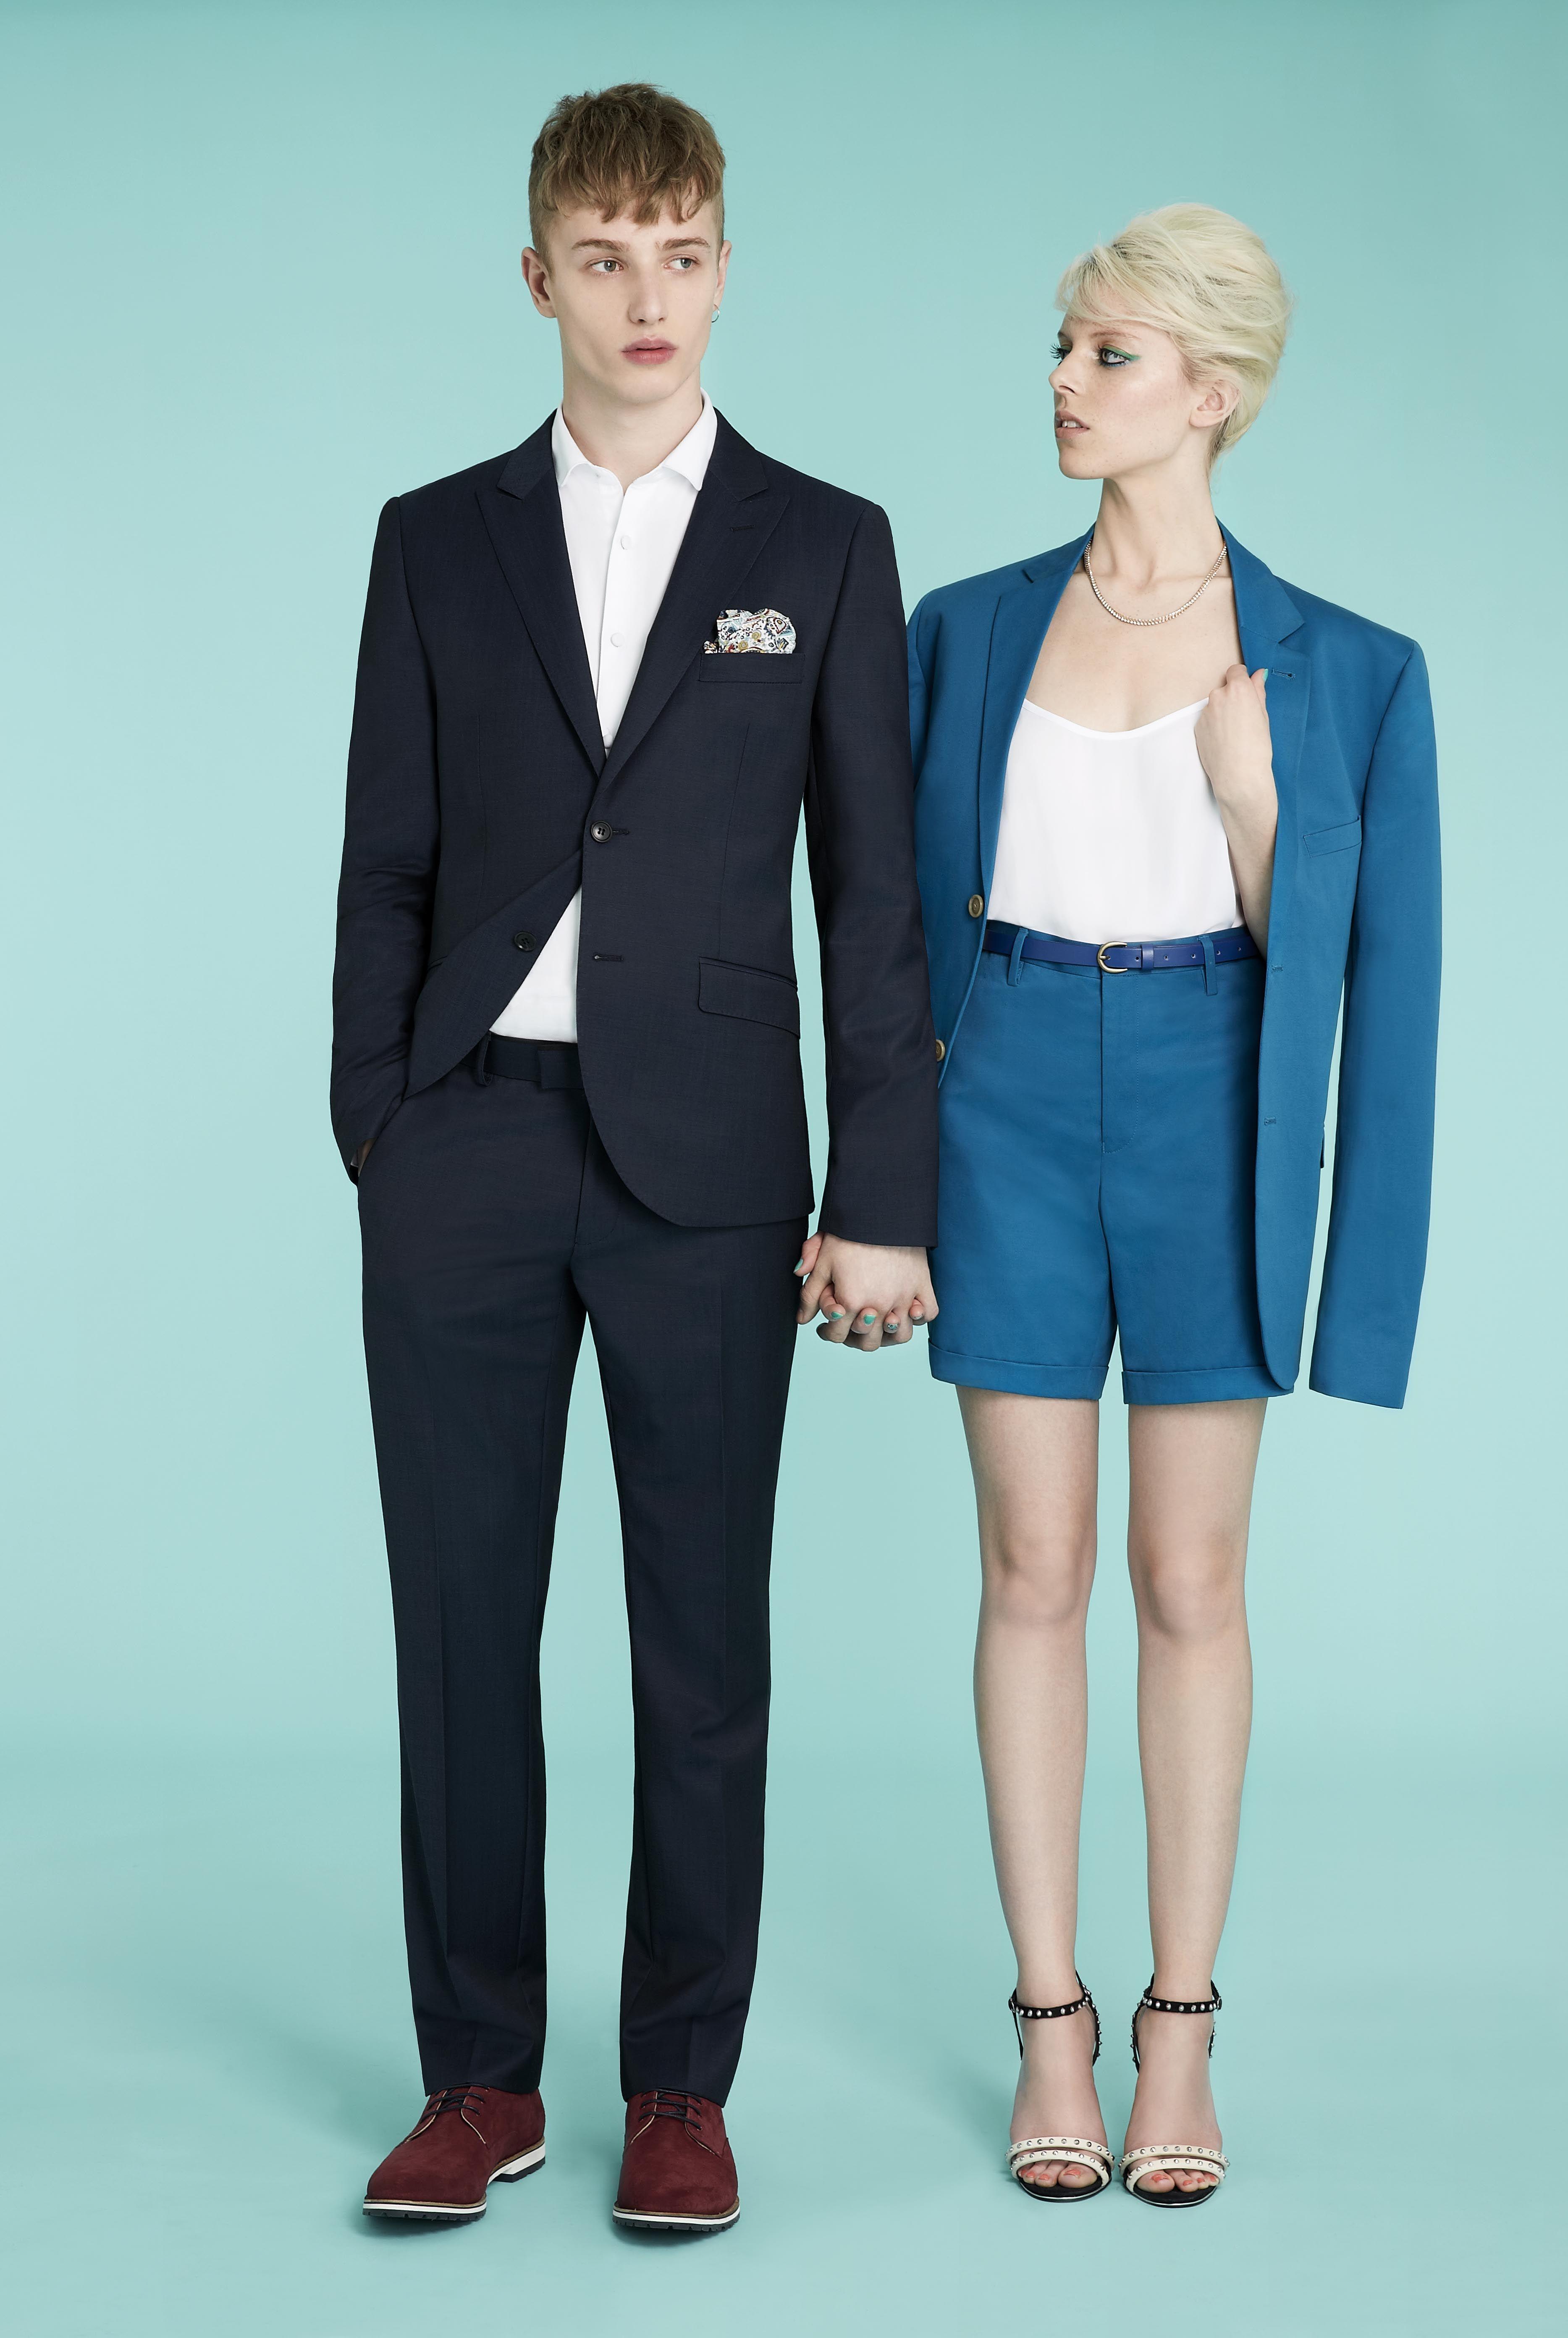 Navy Up Spec Skinny Suit, Topman SS13 Suits http://tpmn.co/12cjC5r ...